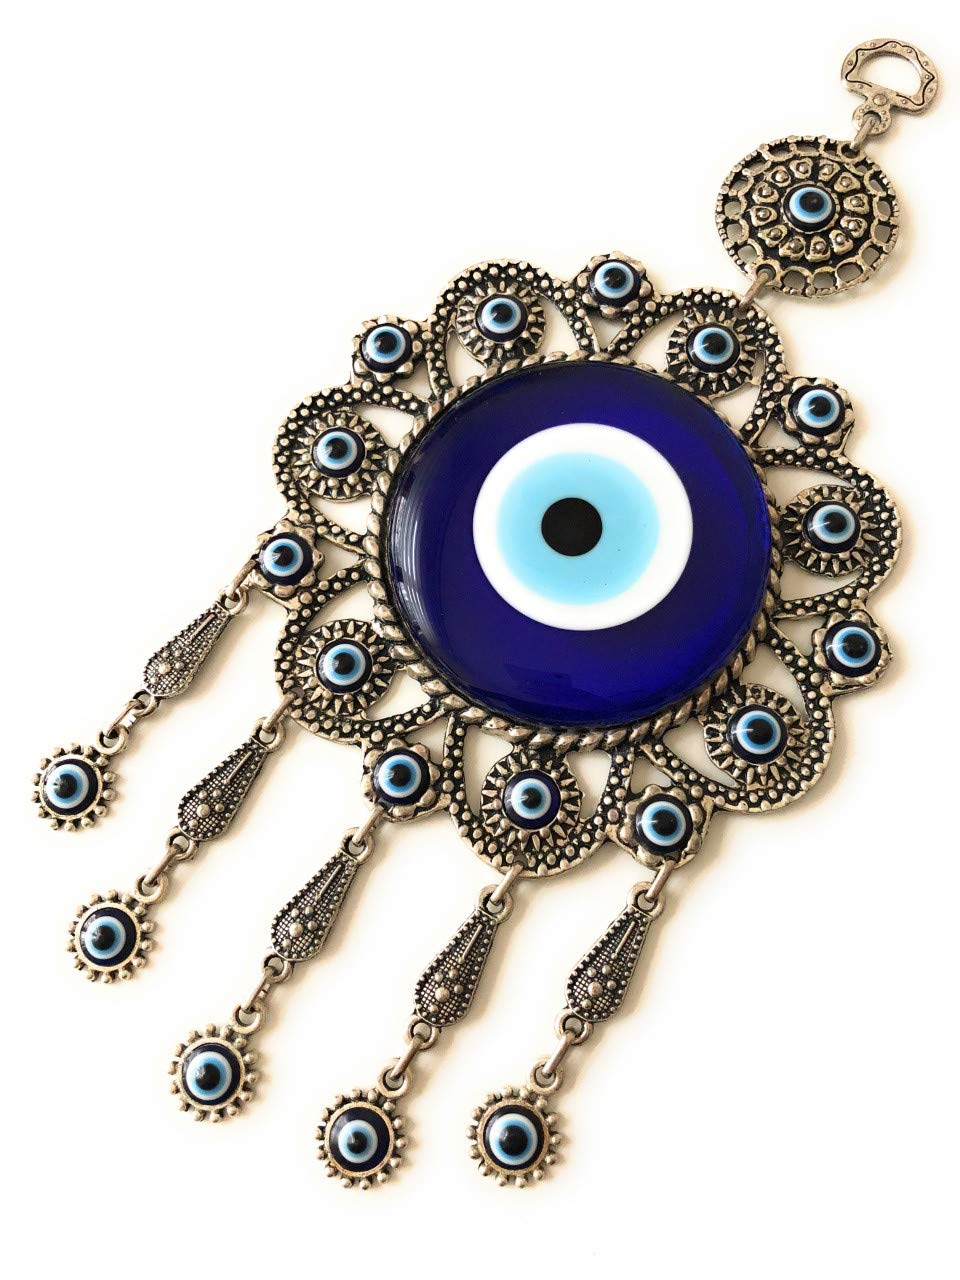 Bion Turkish Blue Evil Eye (Nazar) Flower Hamsa Hand Amulet Wall Hanging Home Decor Protection Good Luck Blessing Housewarming Birthday Gift (Flower)